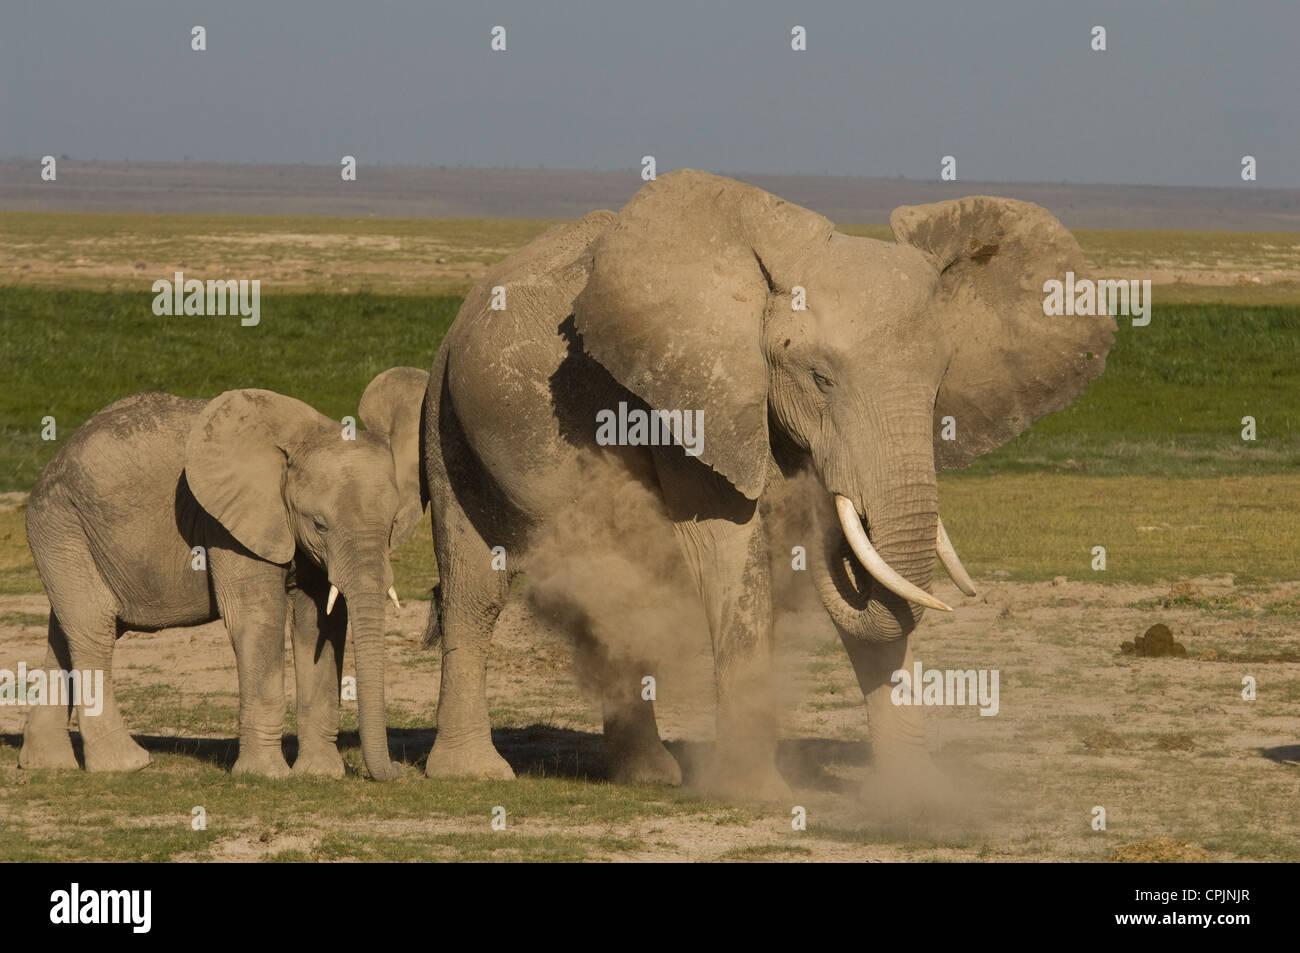 Elephant in herd dusting - Stock Image